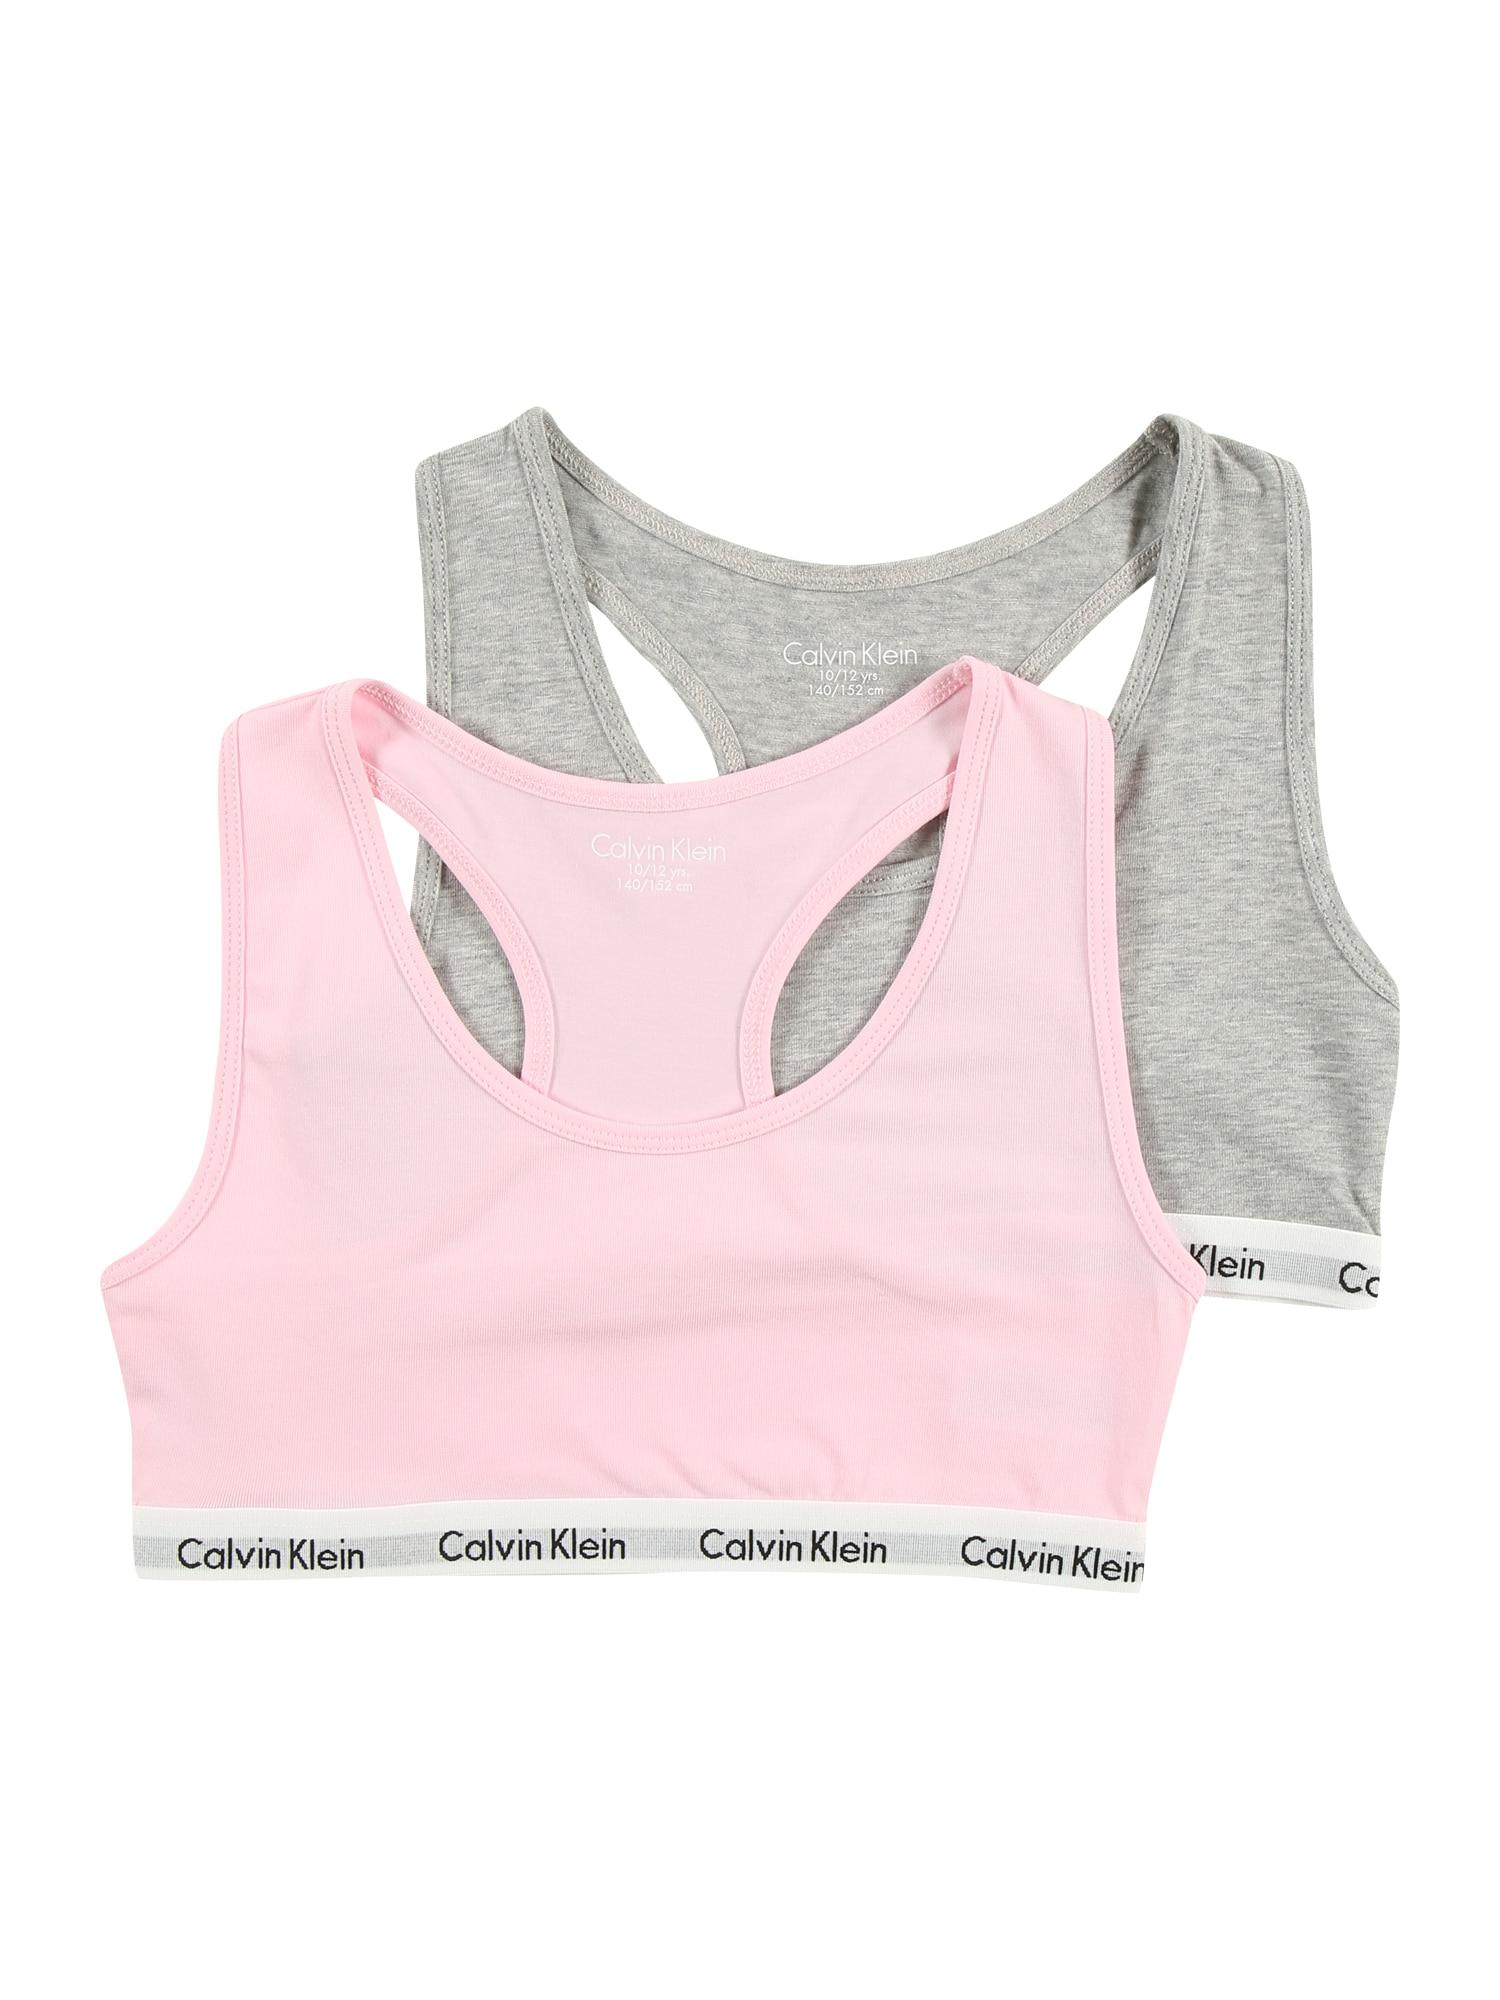 Calvin Klein Underwear Liemenėlė ir kelnaitės pilka / rožių spalva